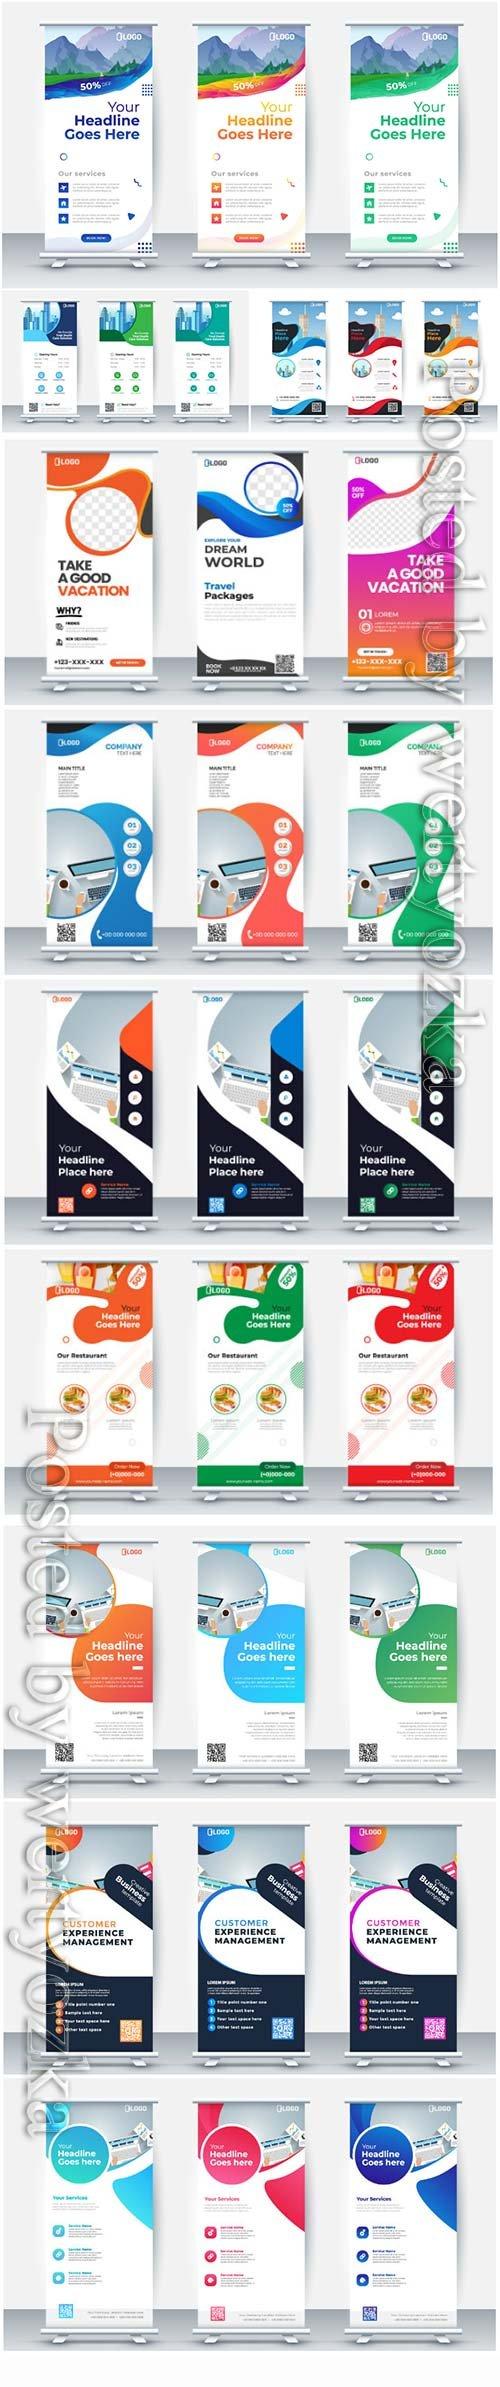 Business roll up banner, vector poster brochure flat design